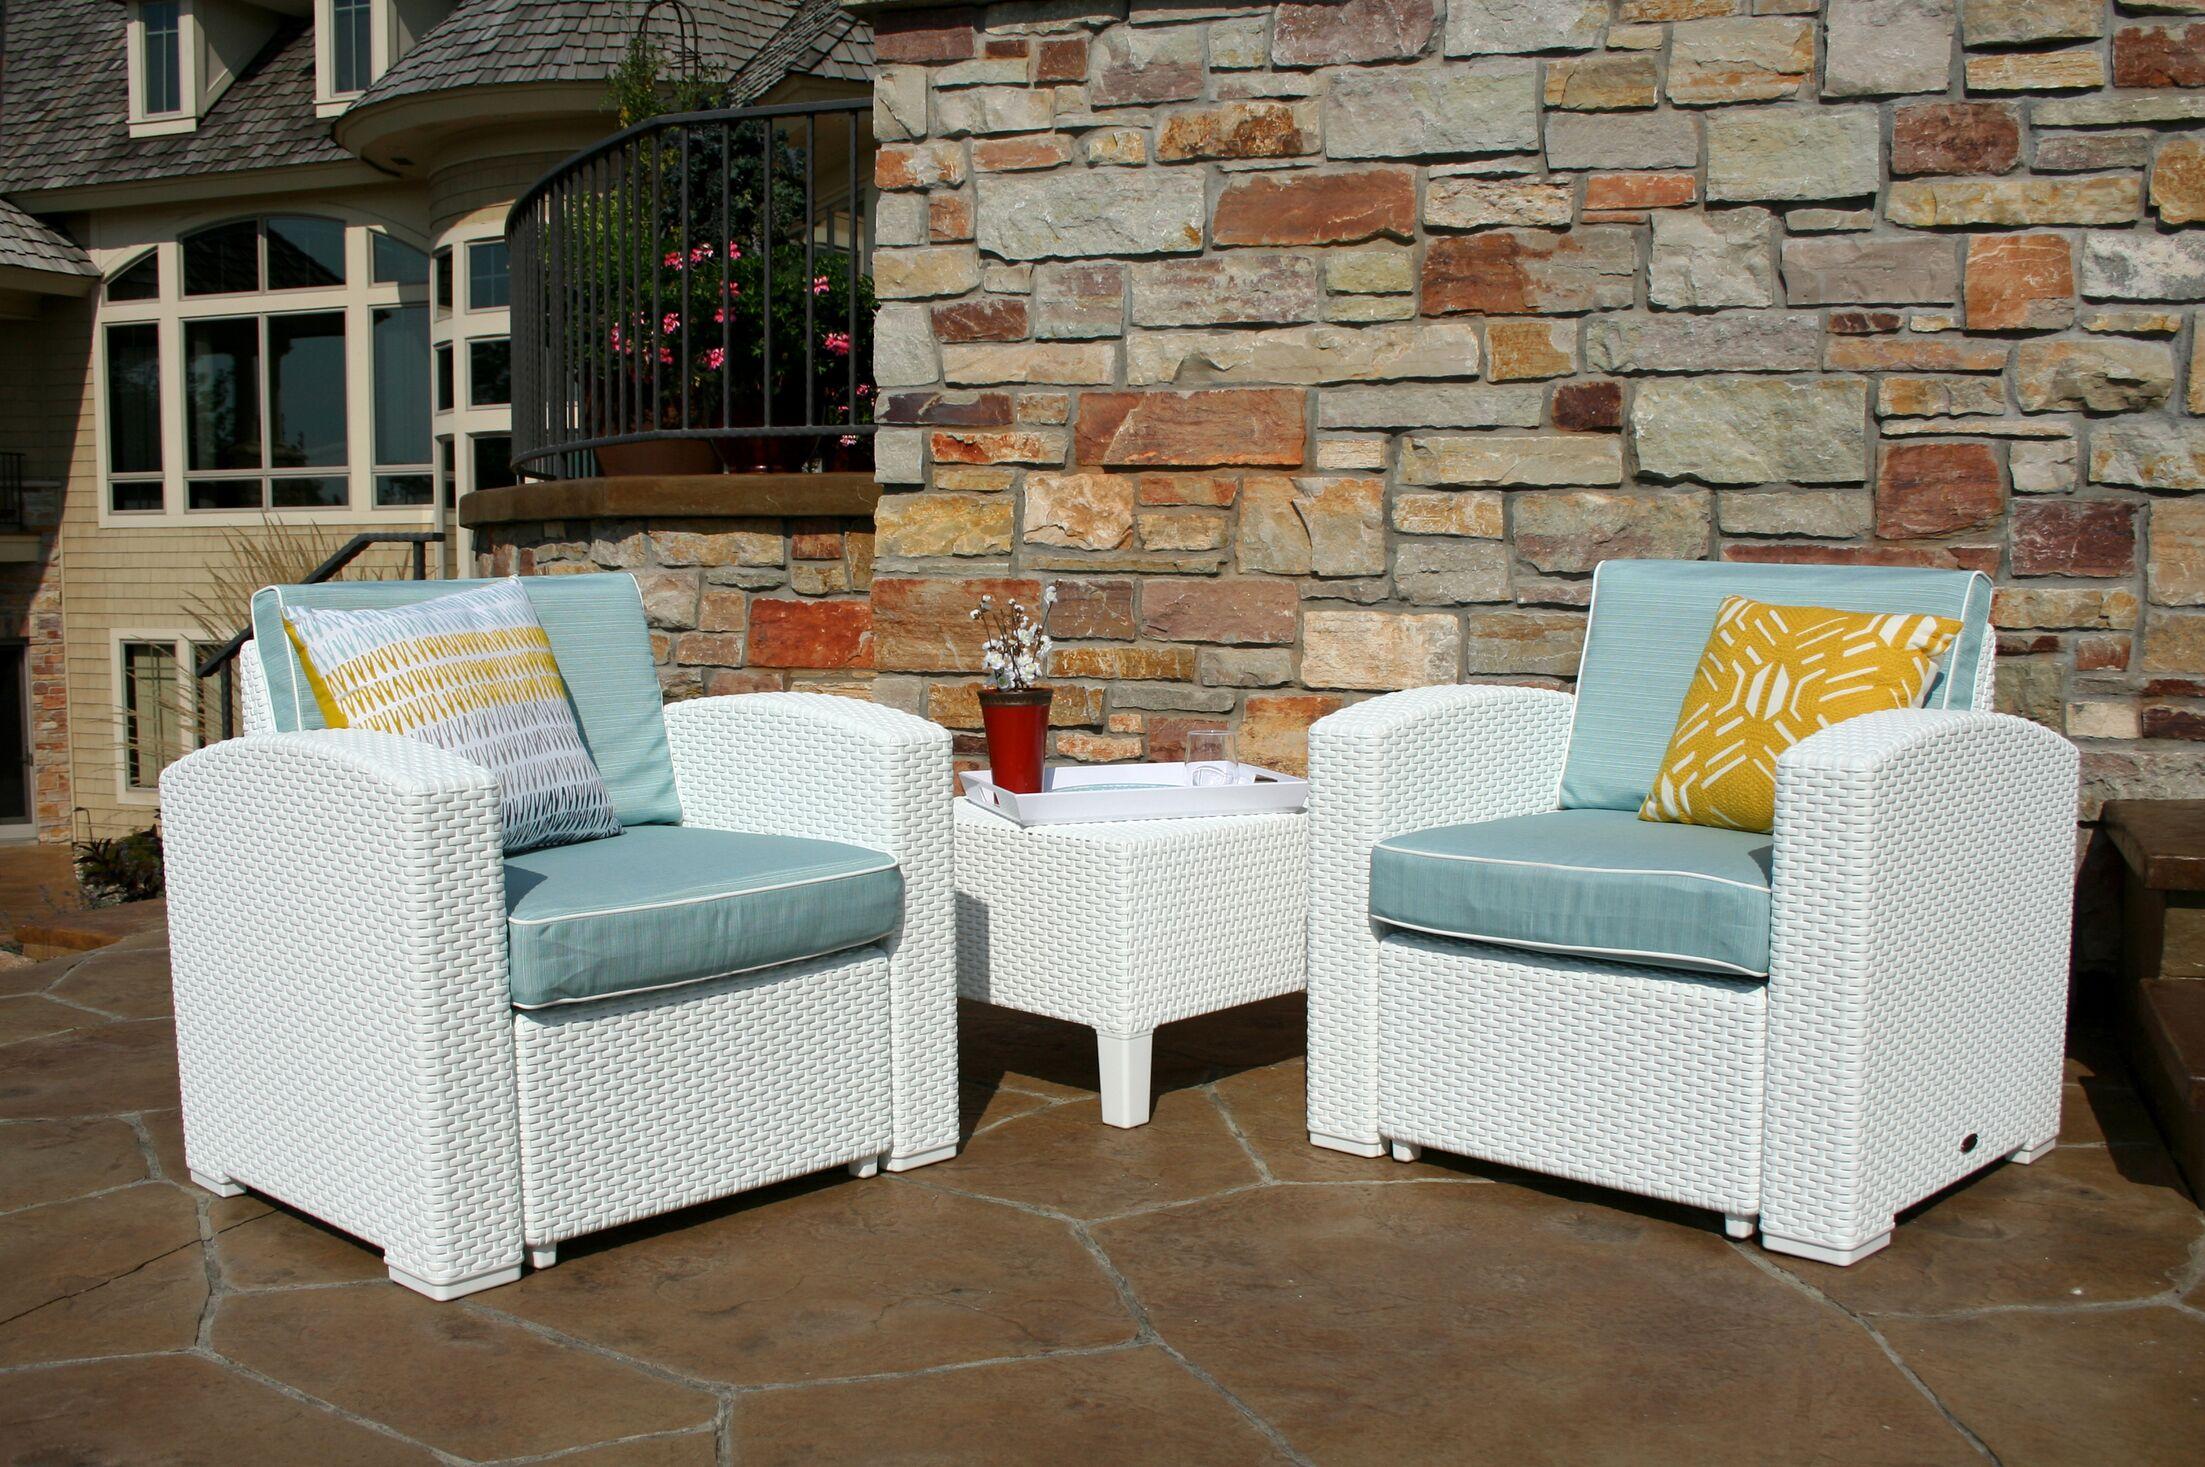 Loggins 3 Piece Conversation Set with Cushions Color: Brown